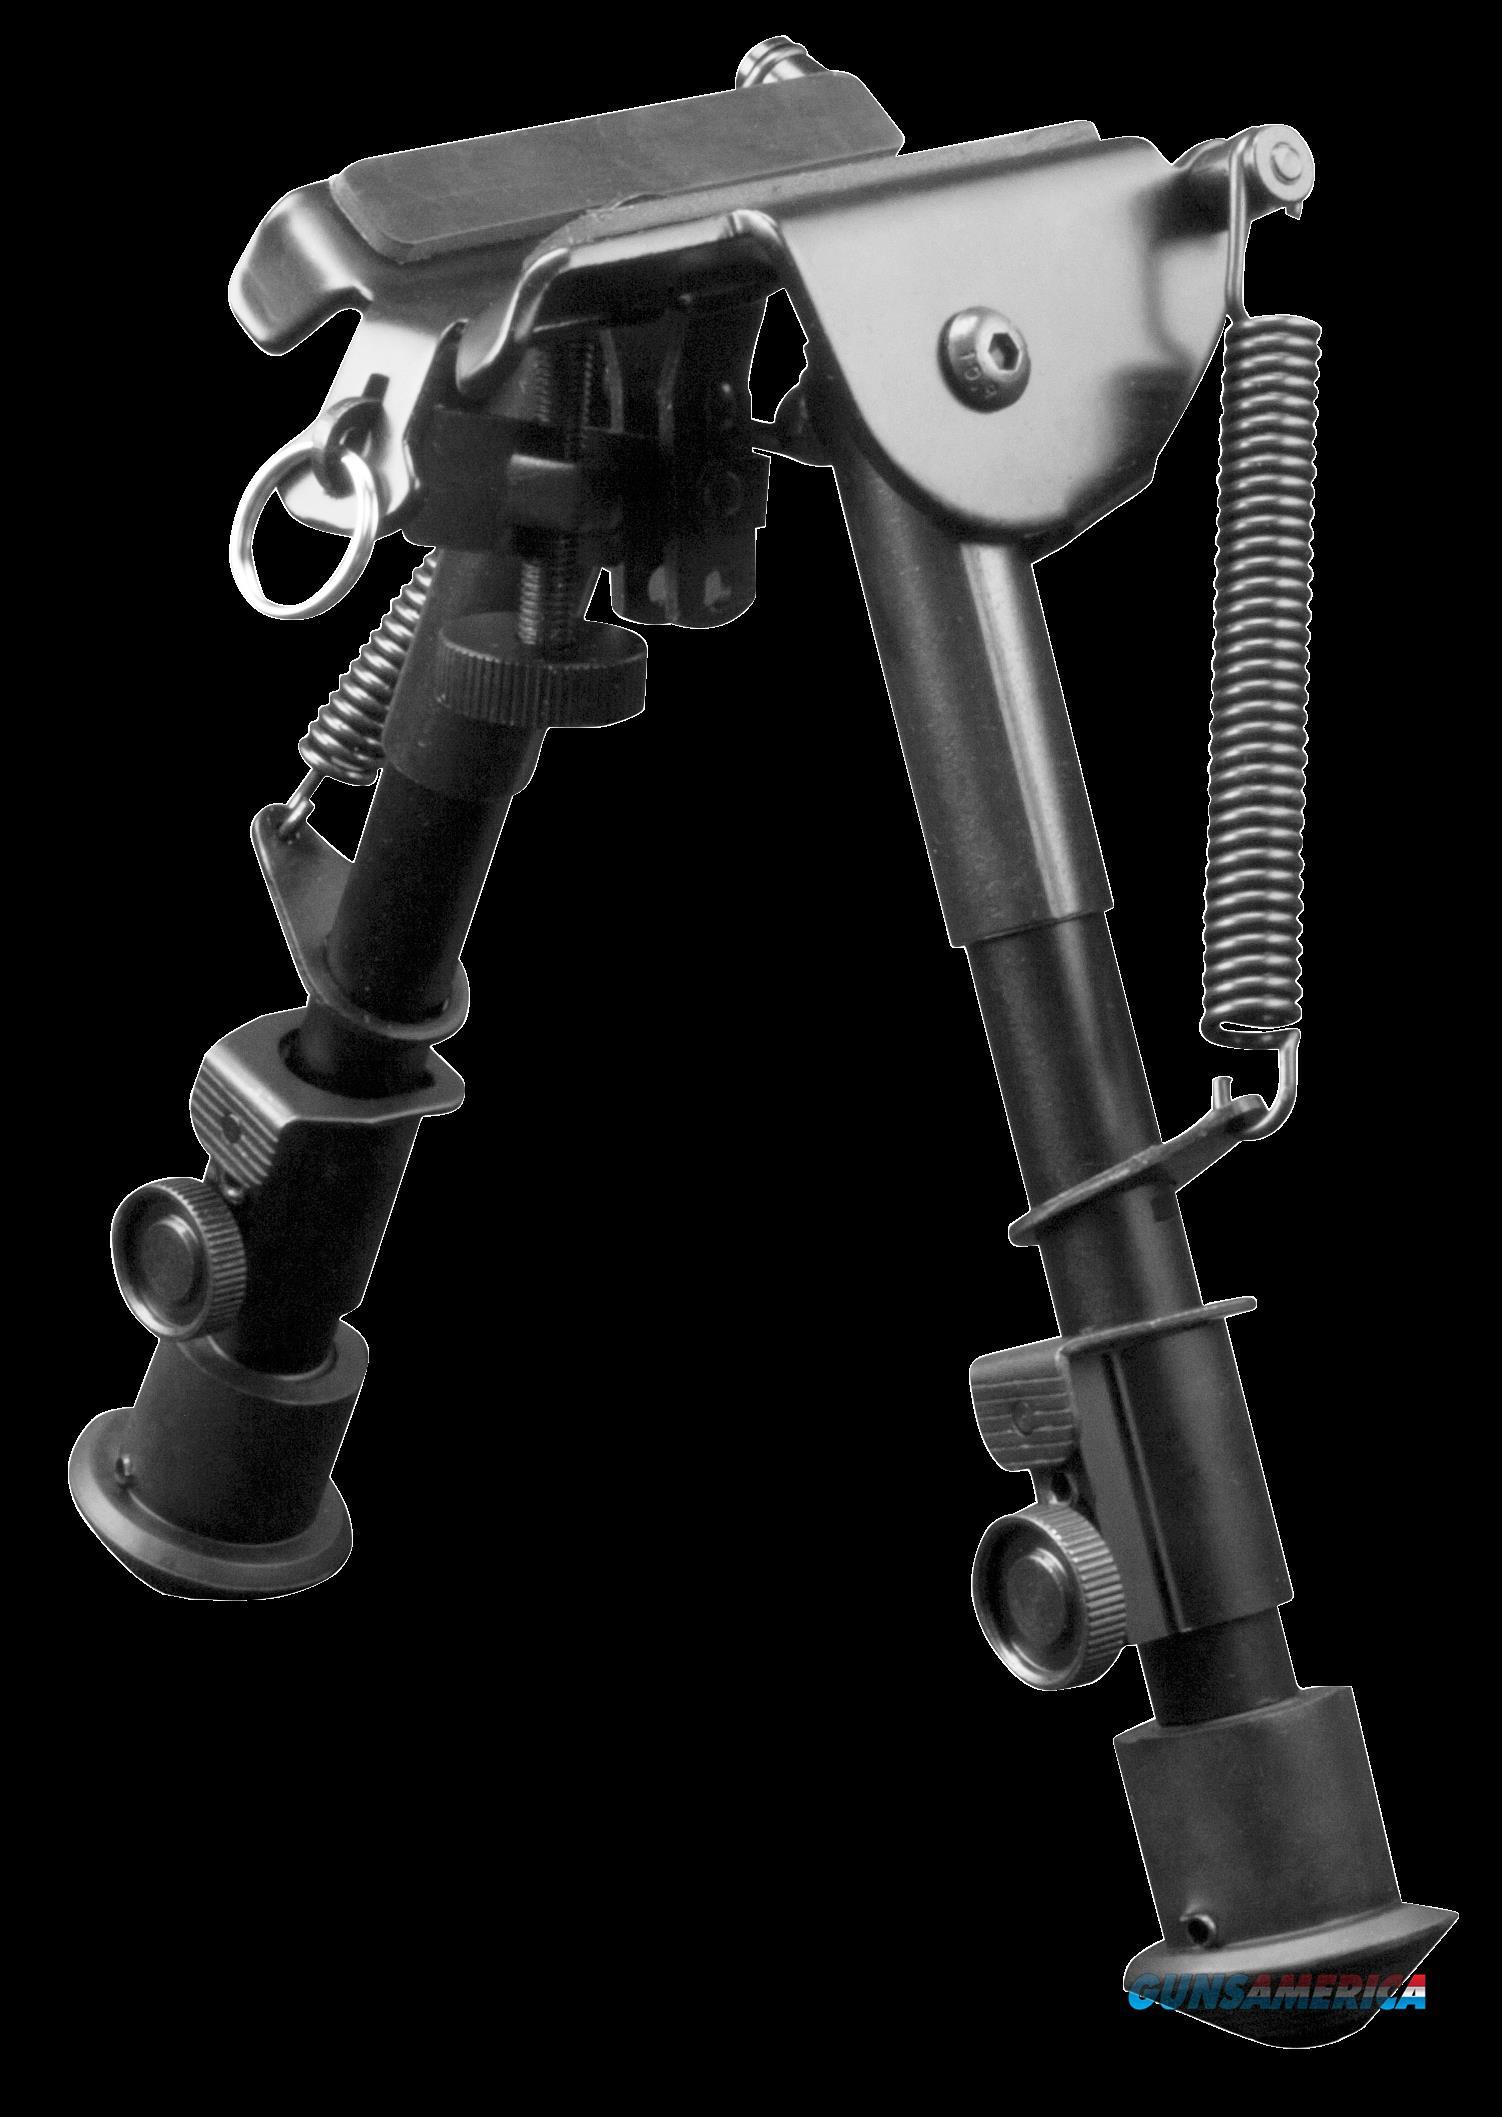 Aim Sports H-style, Aimsports Bphs01    Bipod 6in Small 6-9  Guns > Pistols > 1911 Pistol Copies (non-Colt)